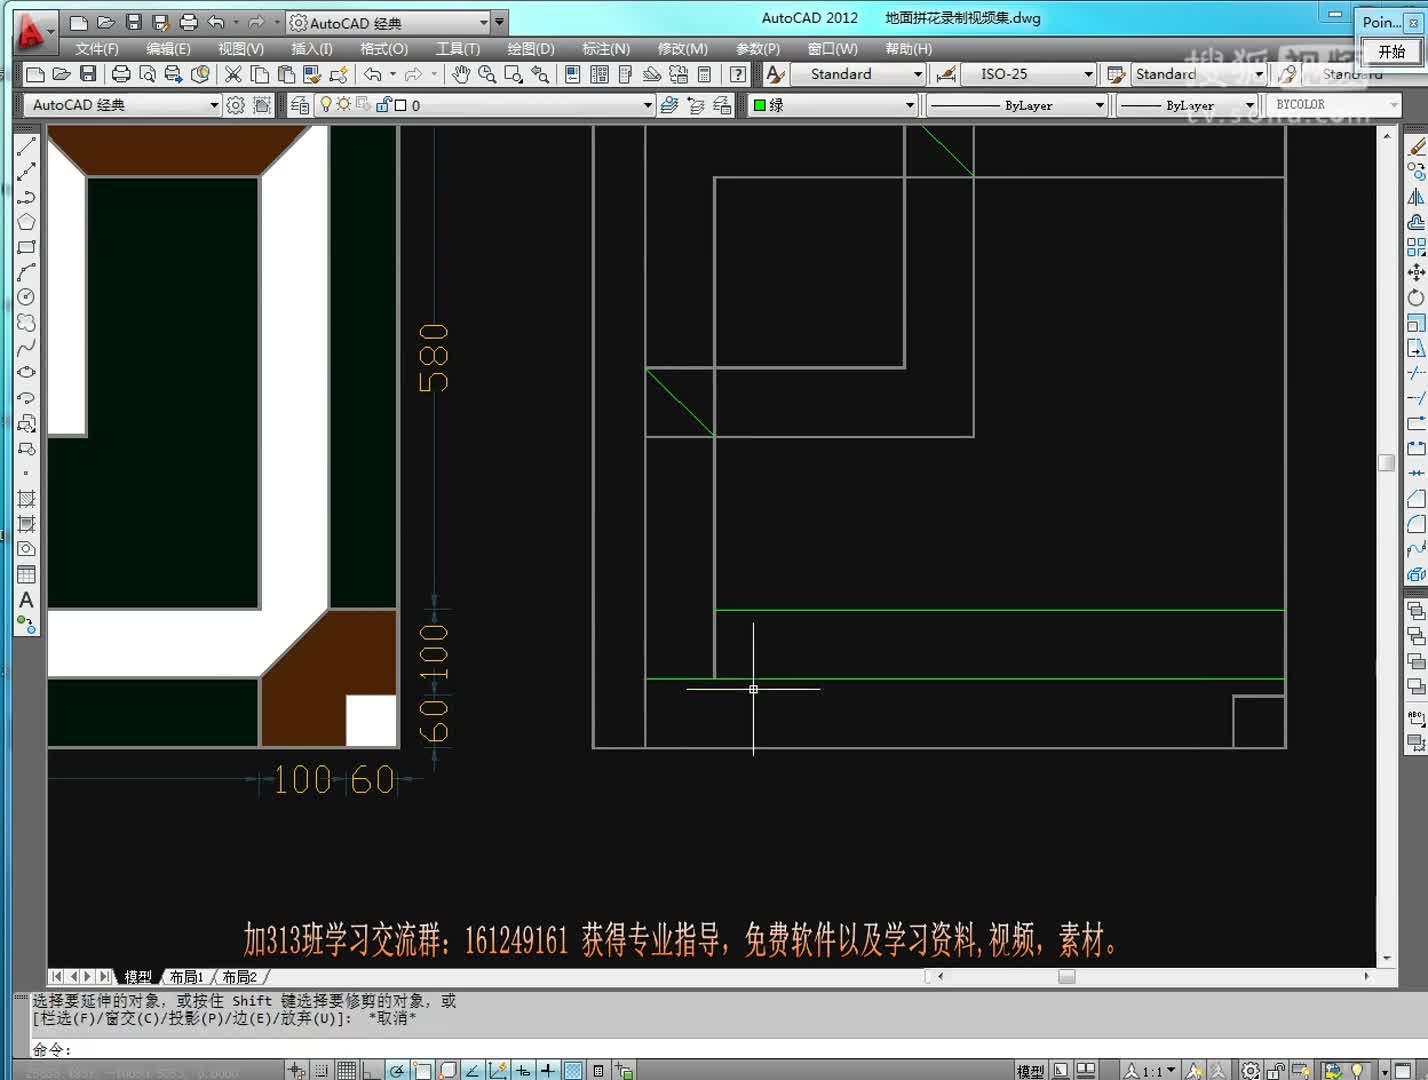 【cad】cad教程 室内设计培训 cad图纸 cad制图初学入门 家装-地面